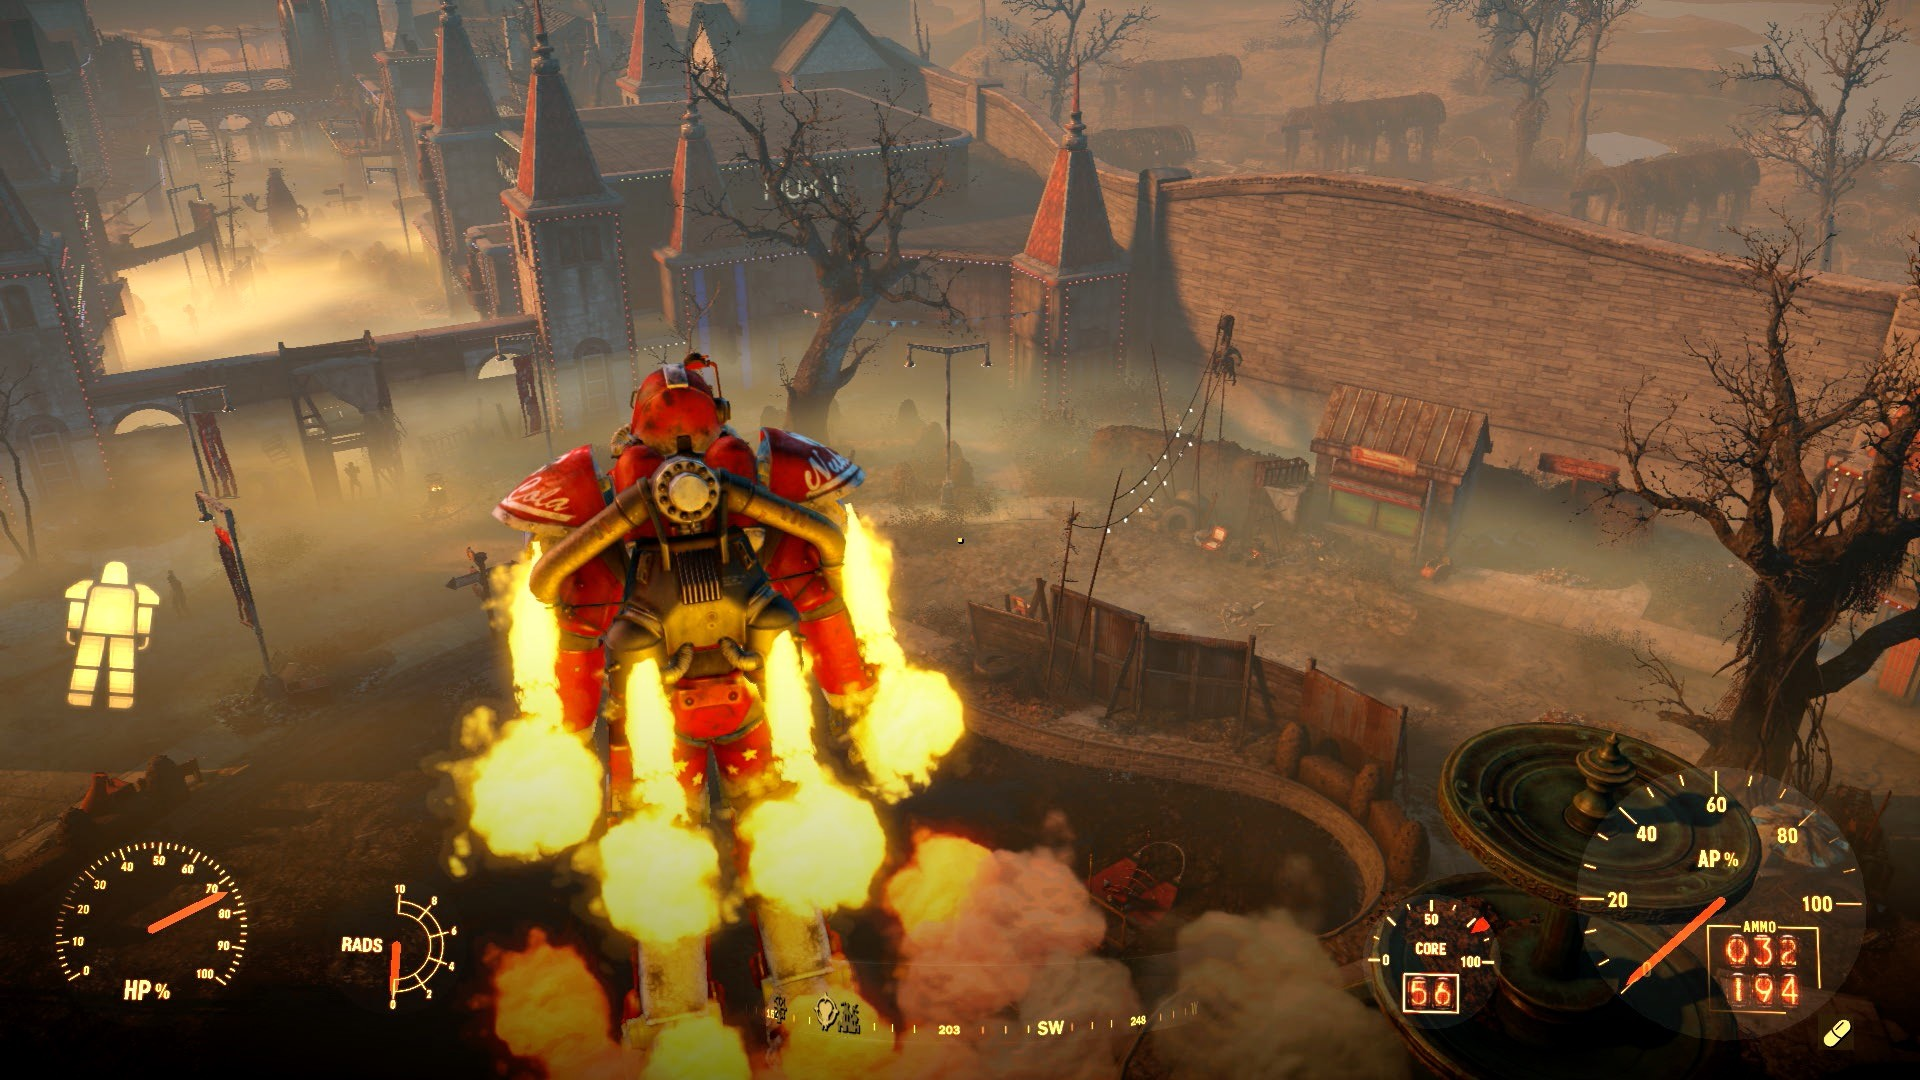 Res: 1920x1080, Fallout 4: Nuka-World Videoguide: Nuka Cola Power Armor finden & Tür öffnen